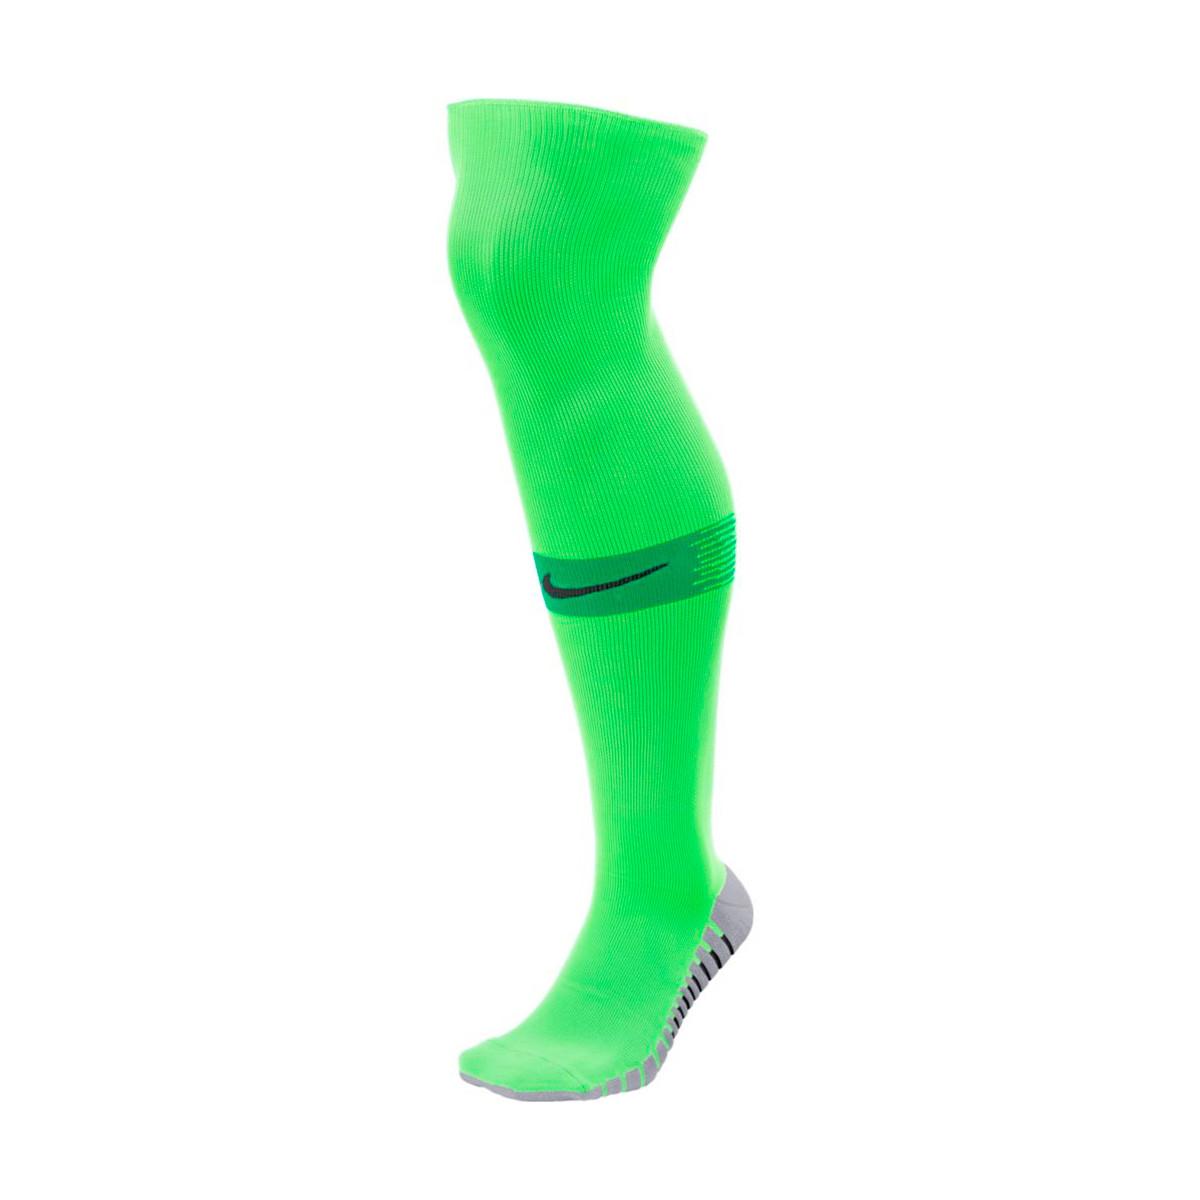 55d0c9796bbc Football Socks Nike Team Matchfit Over-the-Calf Green strike-Green ...